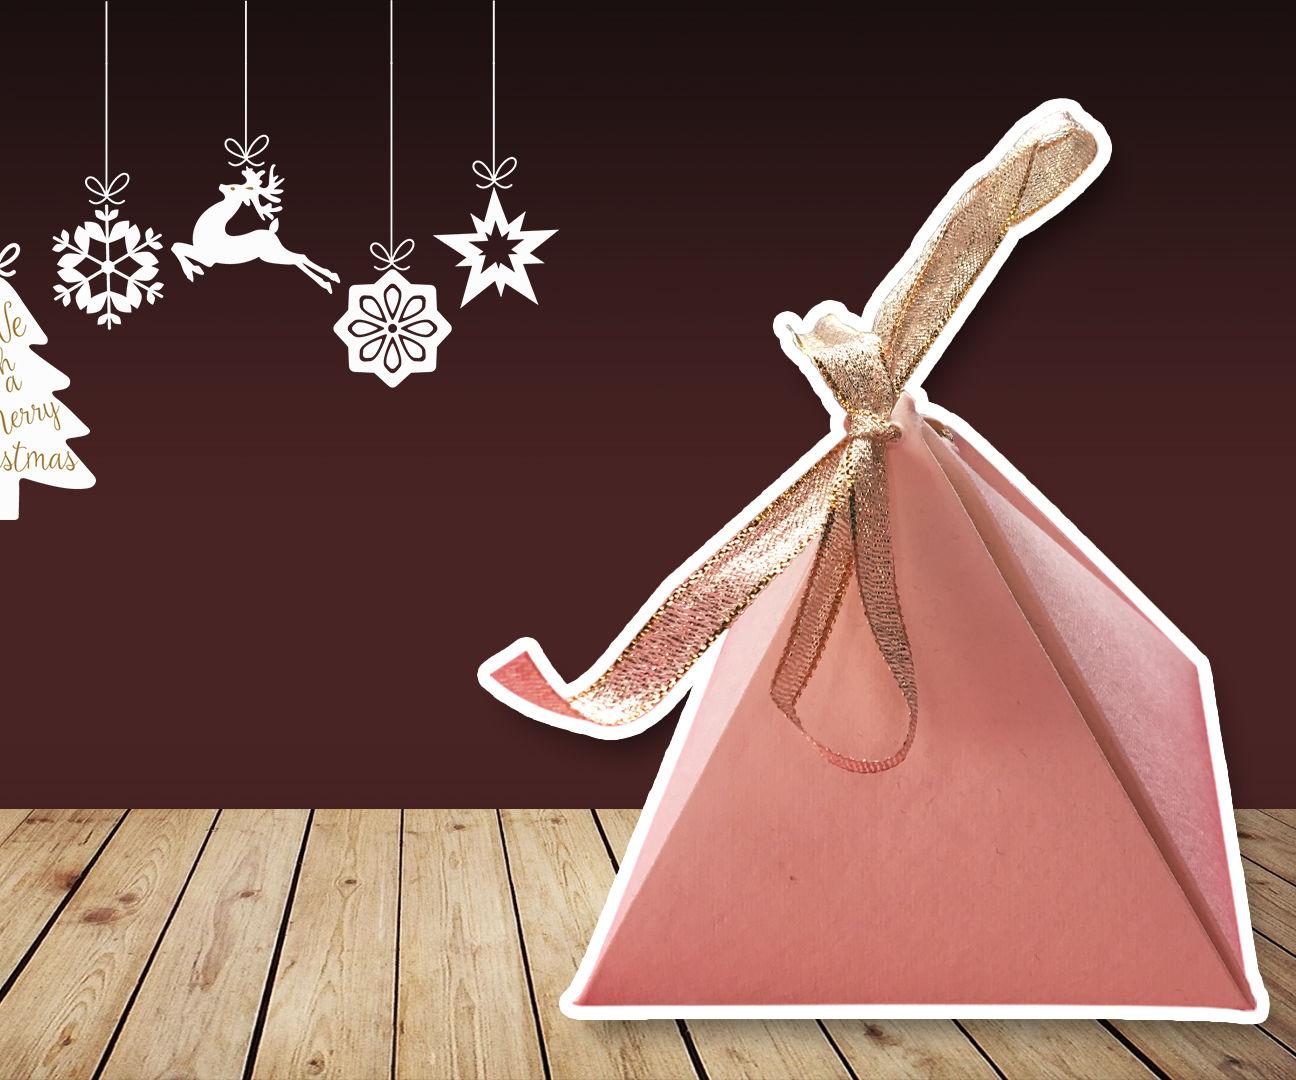 Origami Pyramid Box Tutorial ♥︎ DIY ♥︎ Cute Gift Box ♥︎   Christmas Gift Ideas!